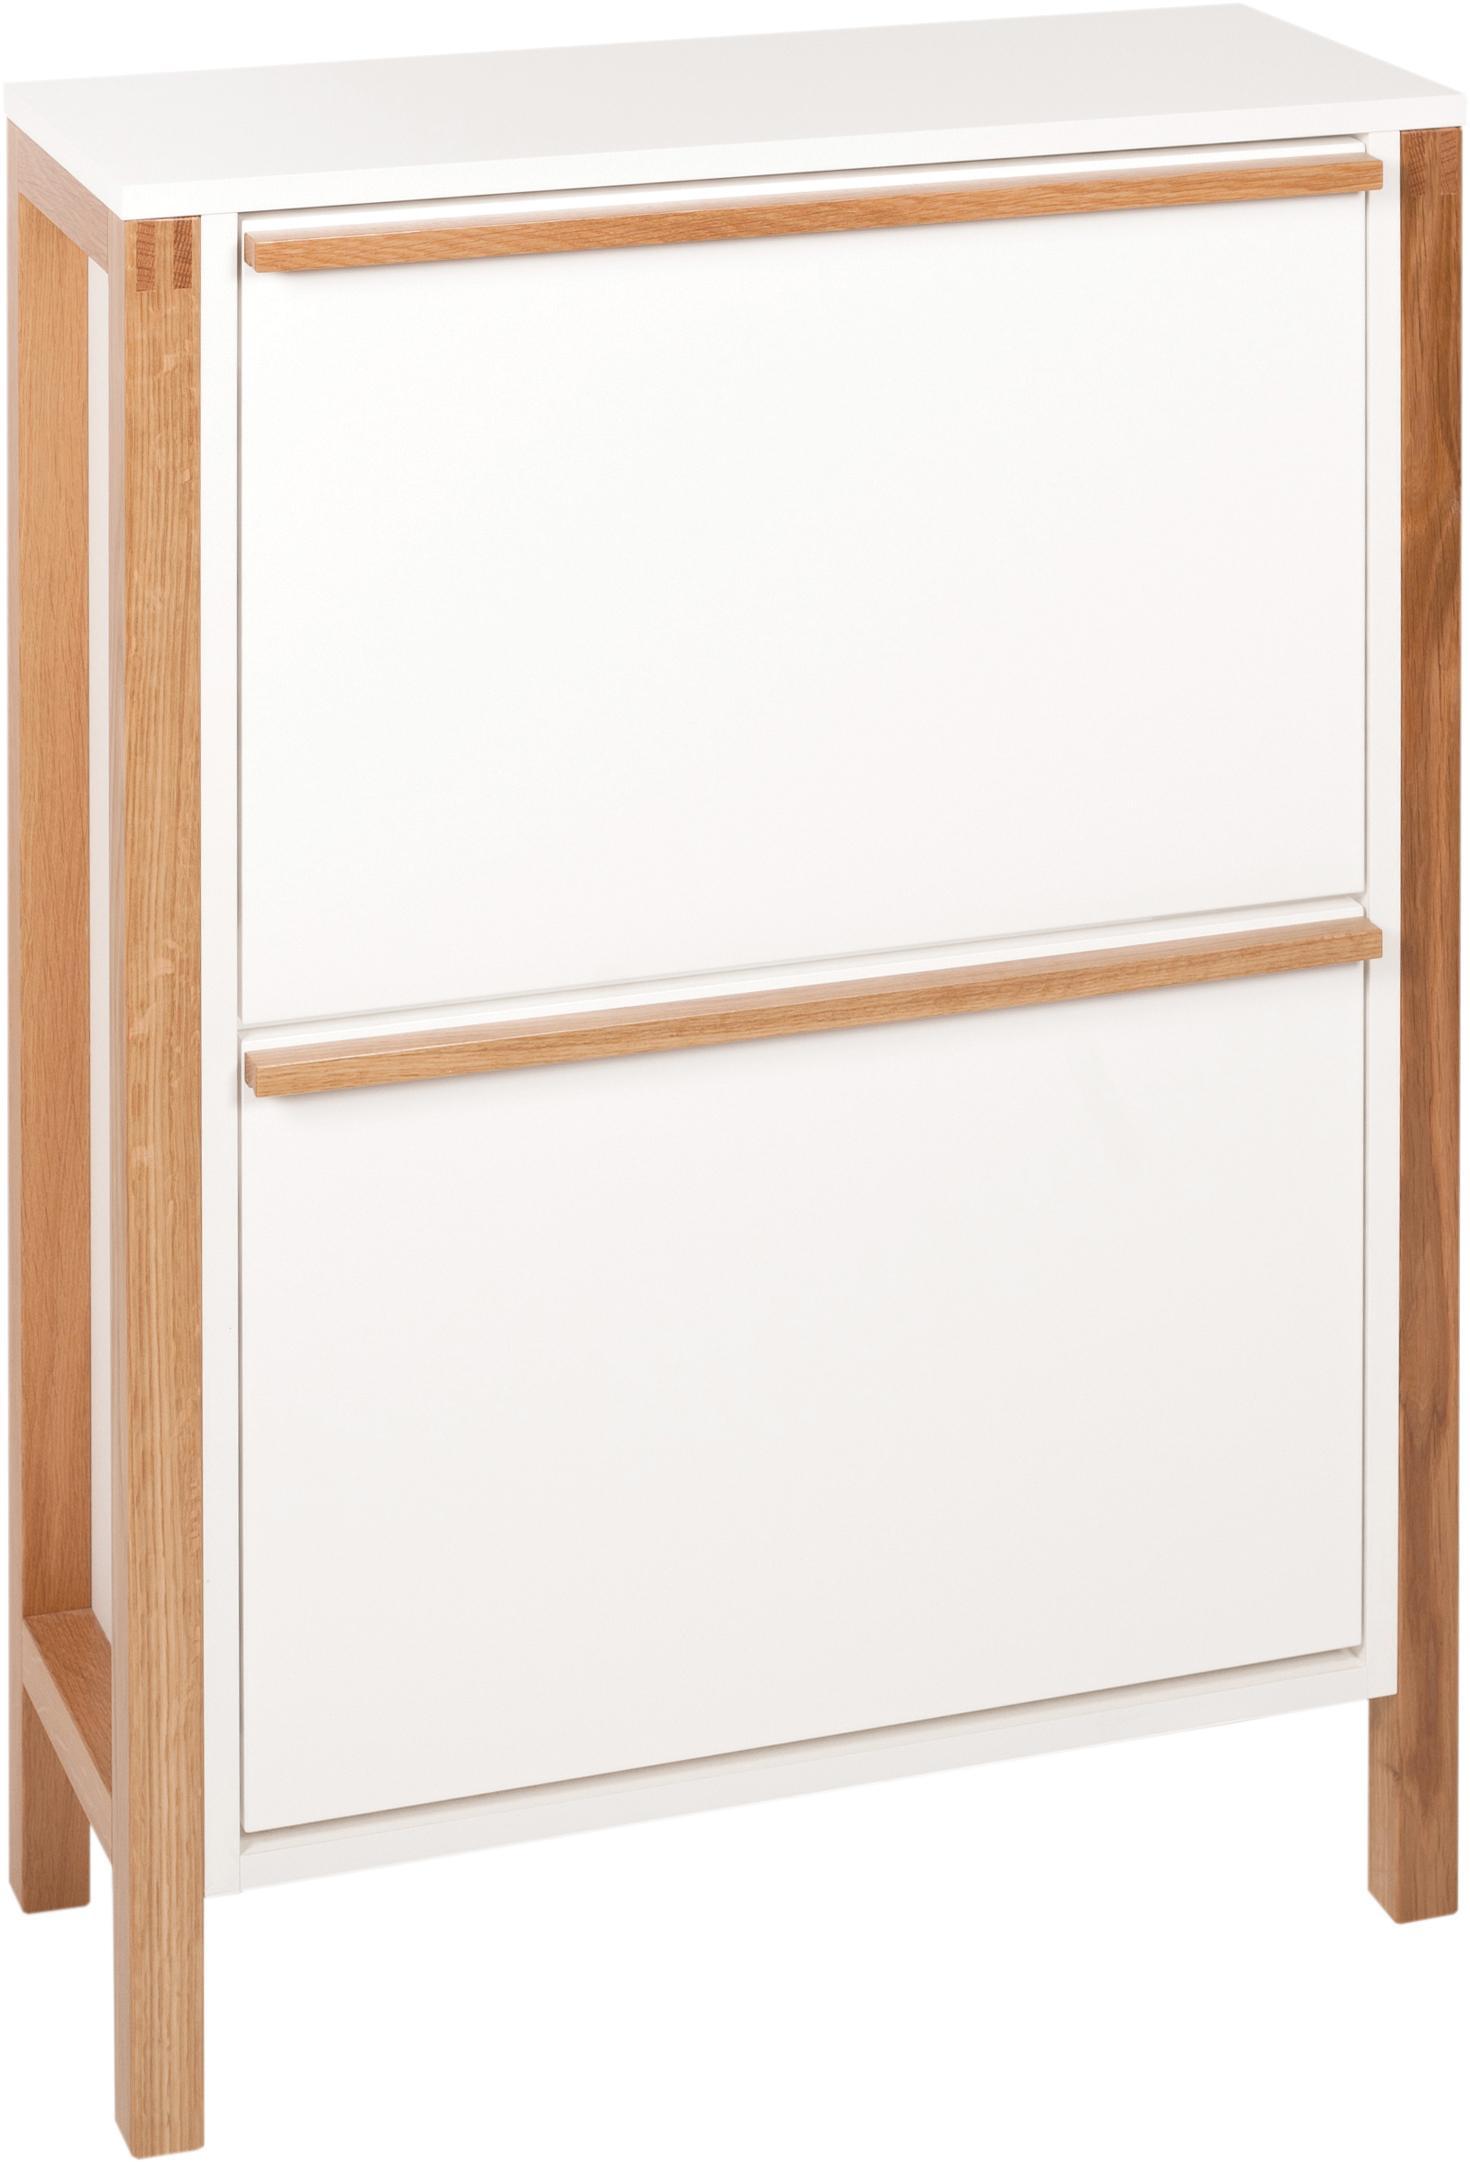 Zapatero Northgate, 2 compartimentos plegables, Estructura: tablero de fibras de dens, Blanco, roble, An 65 x Al 93 cm